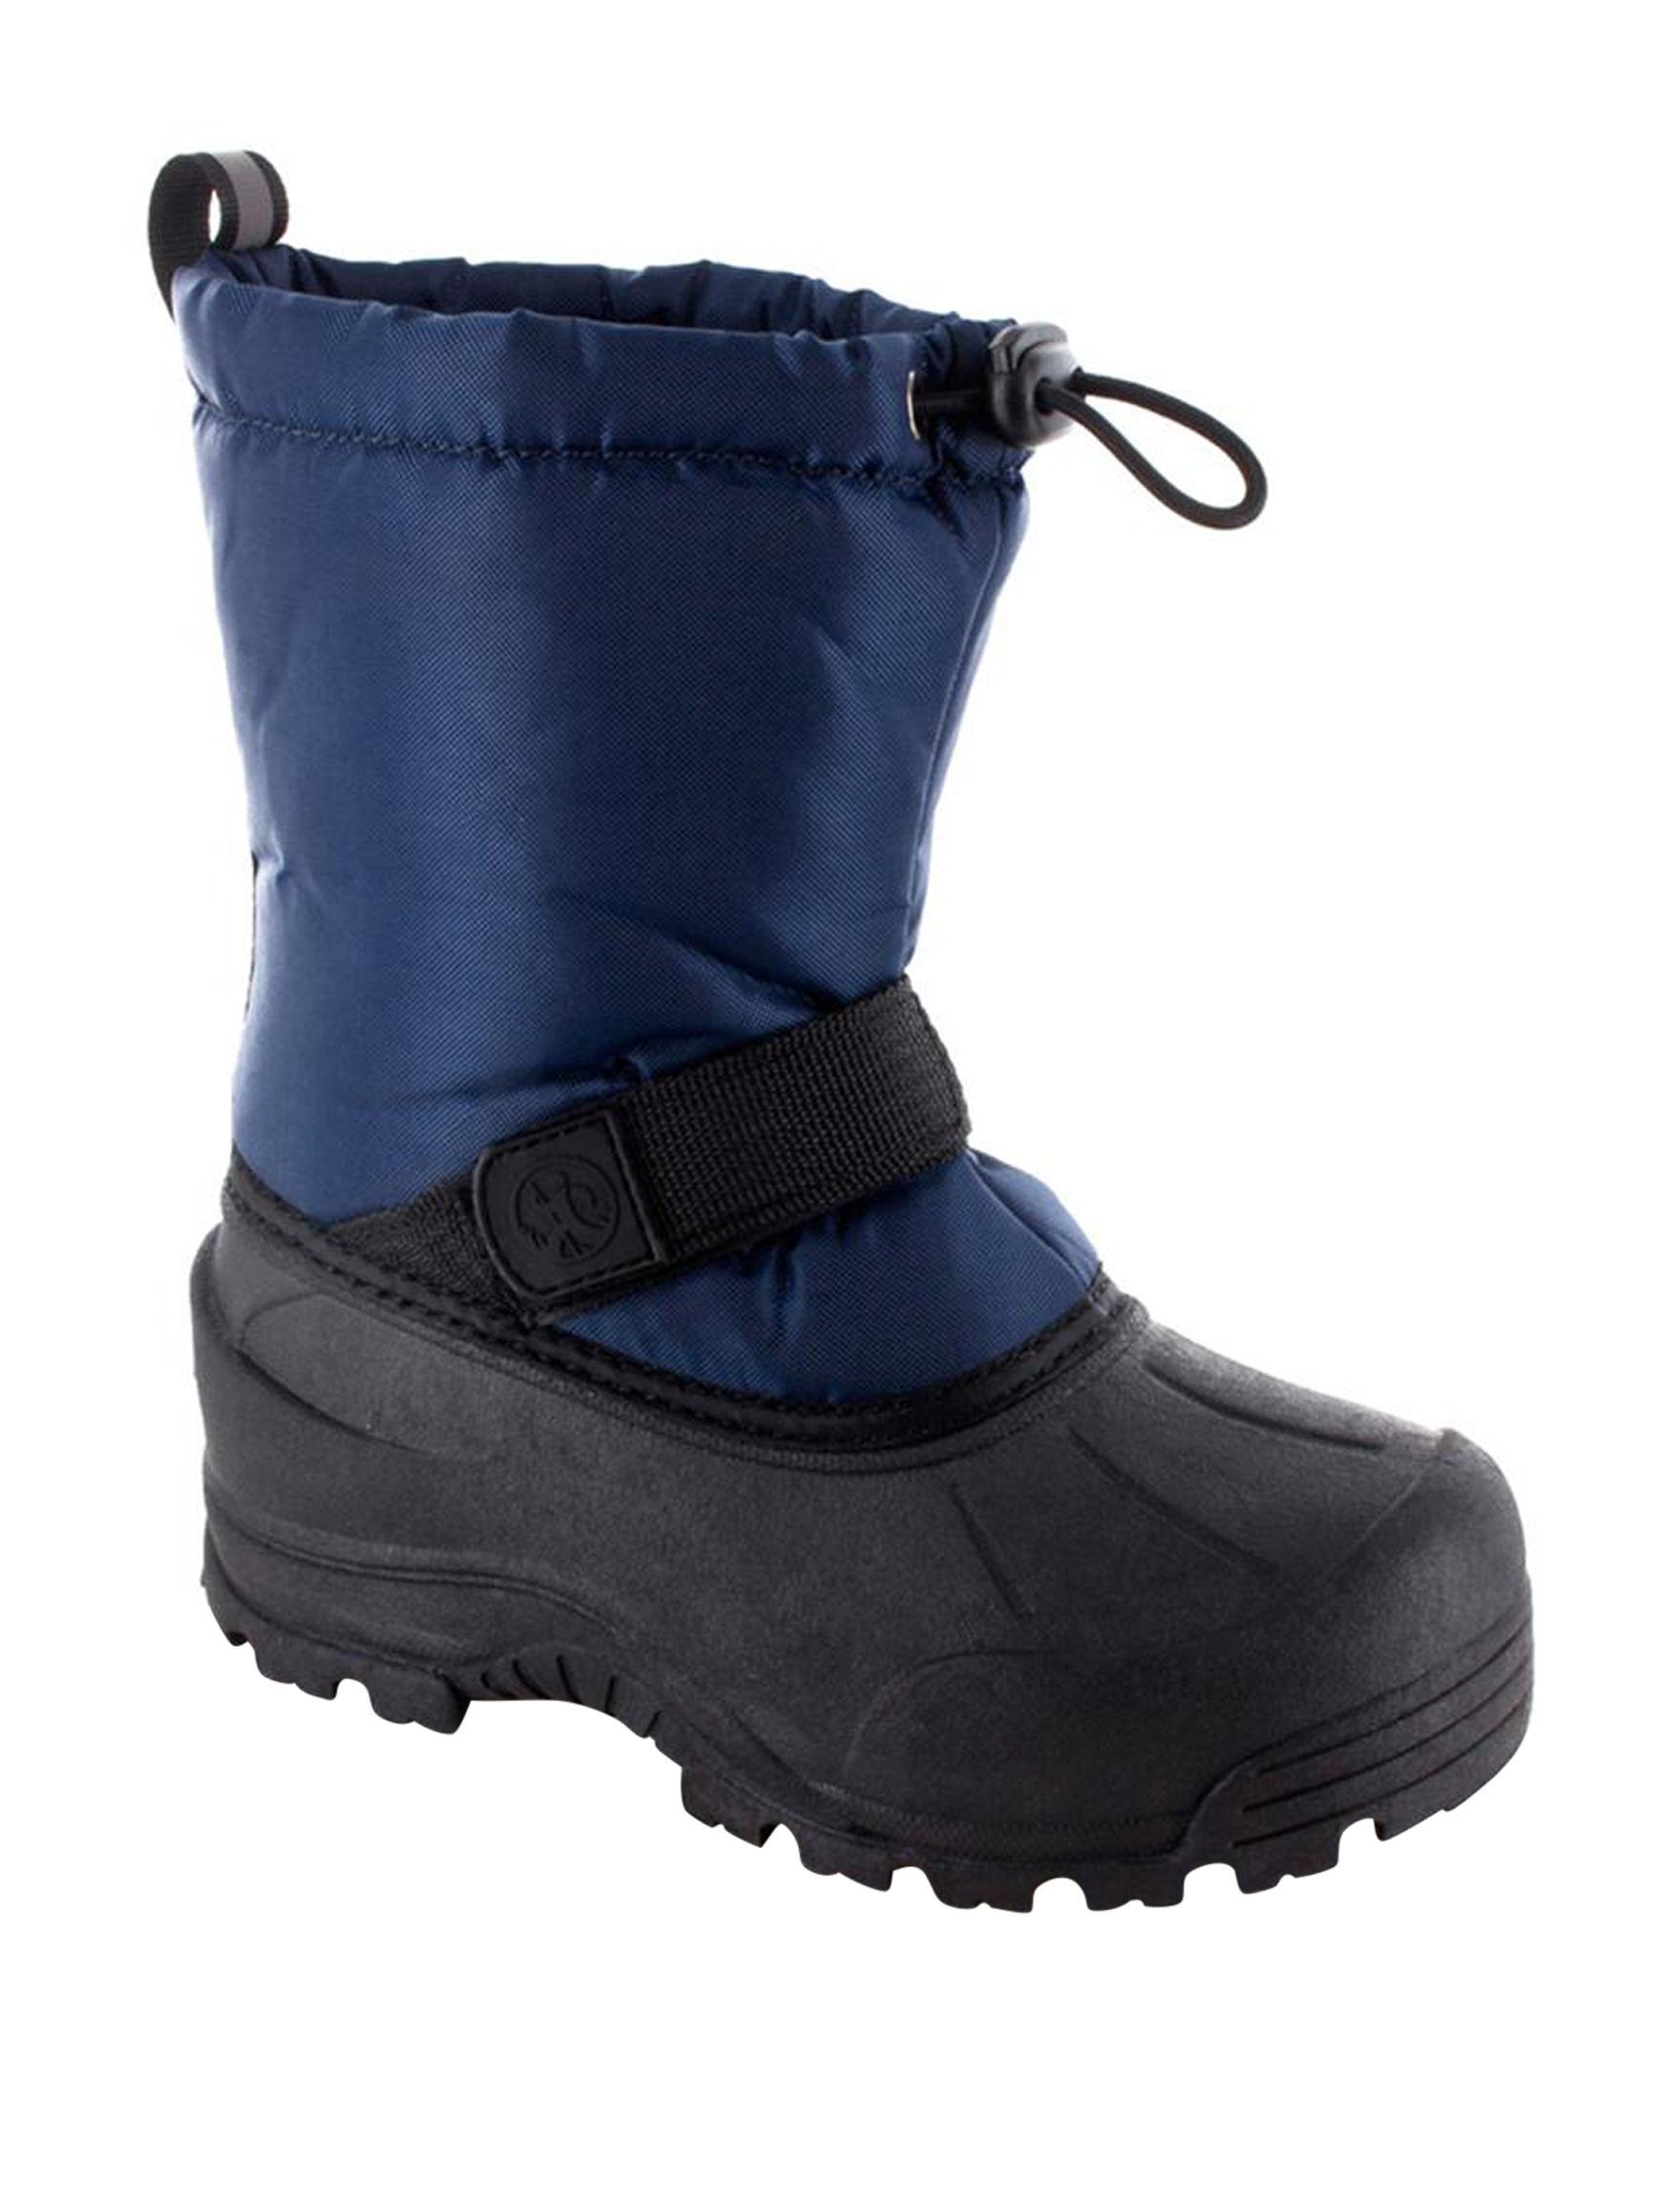 Northside Navy Winter Boots